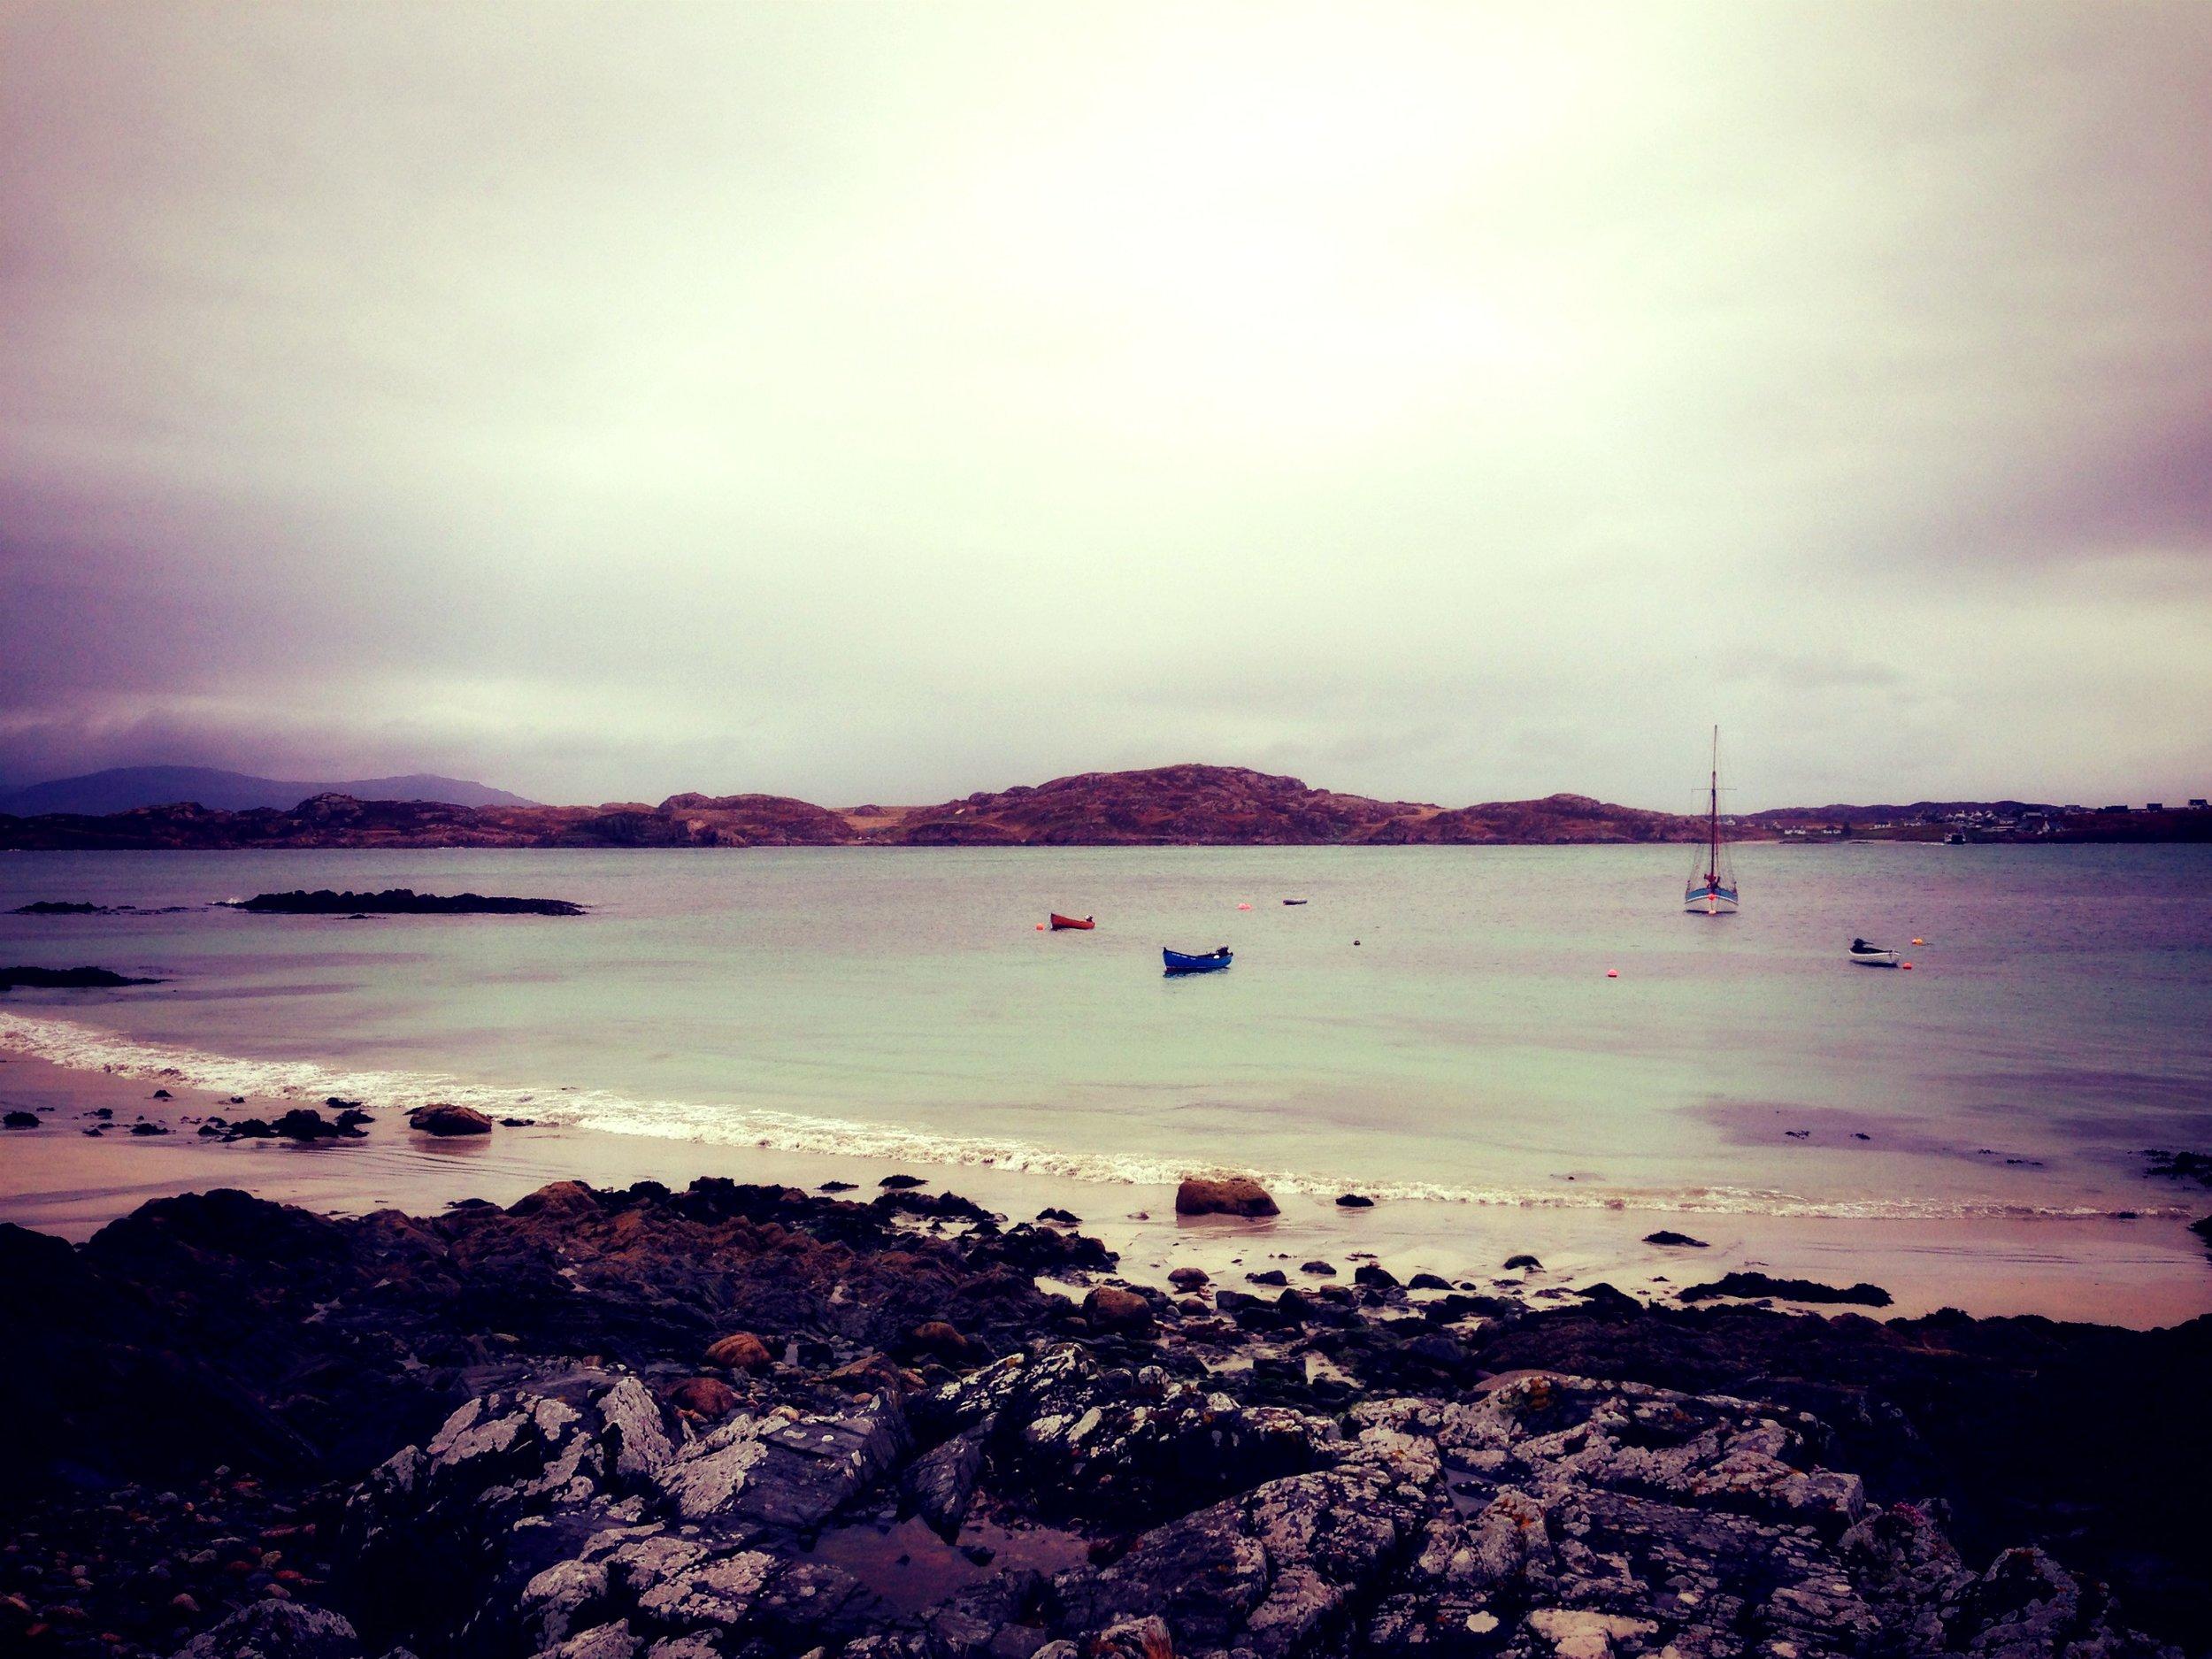 Martyr's Bay